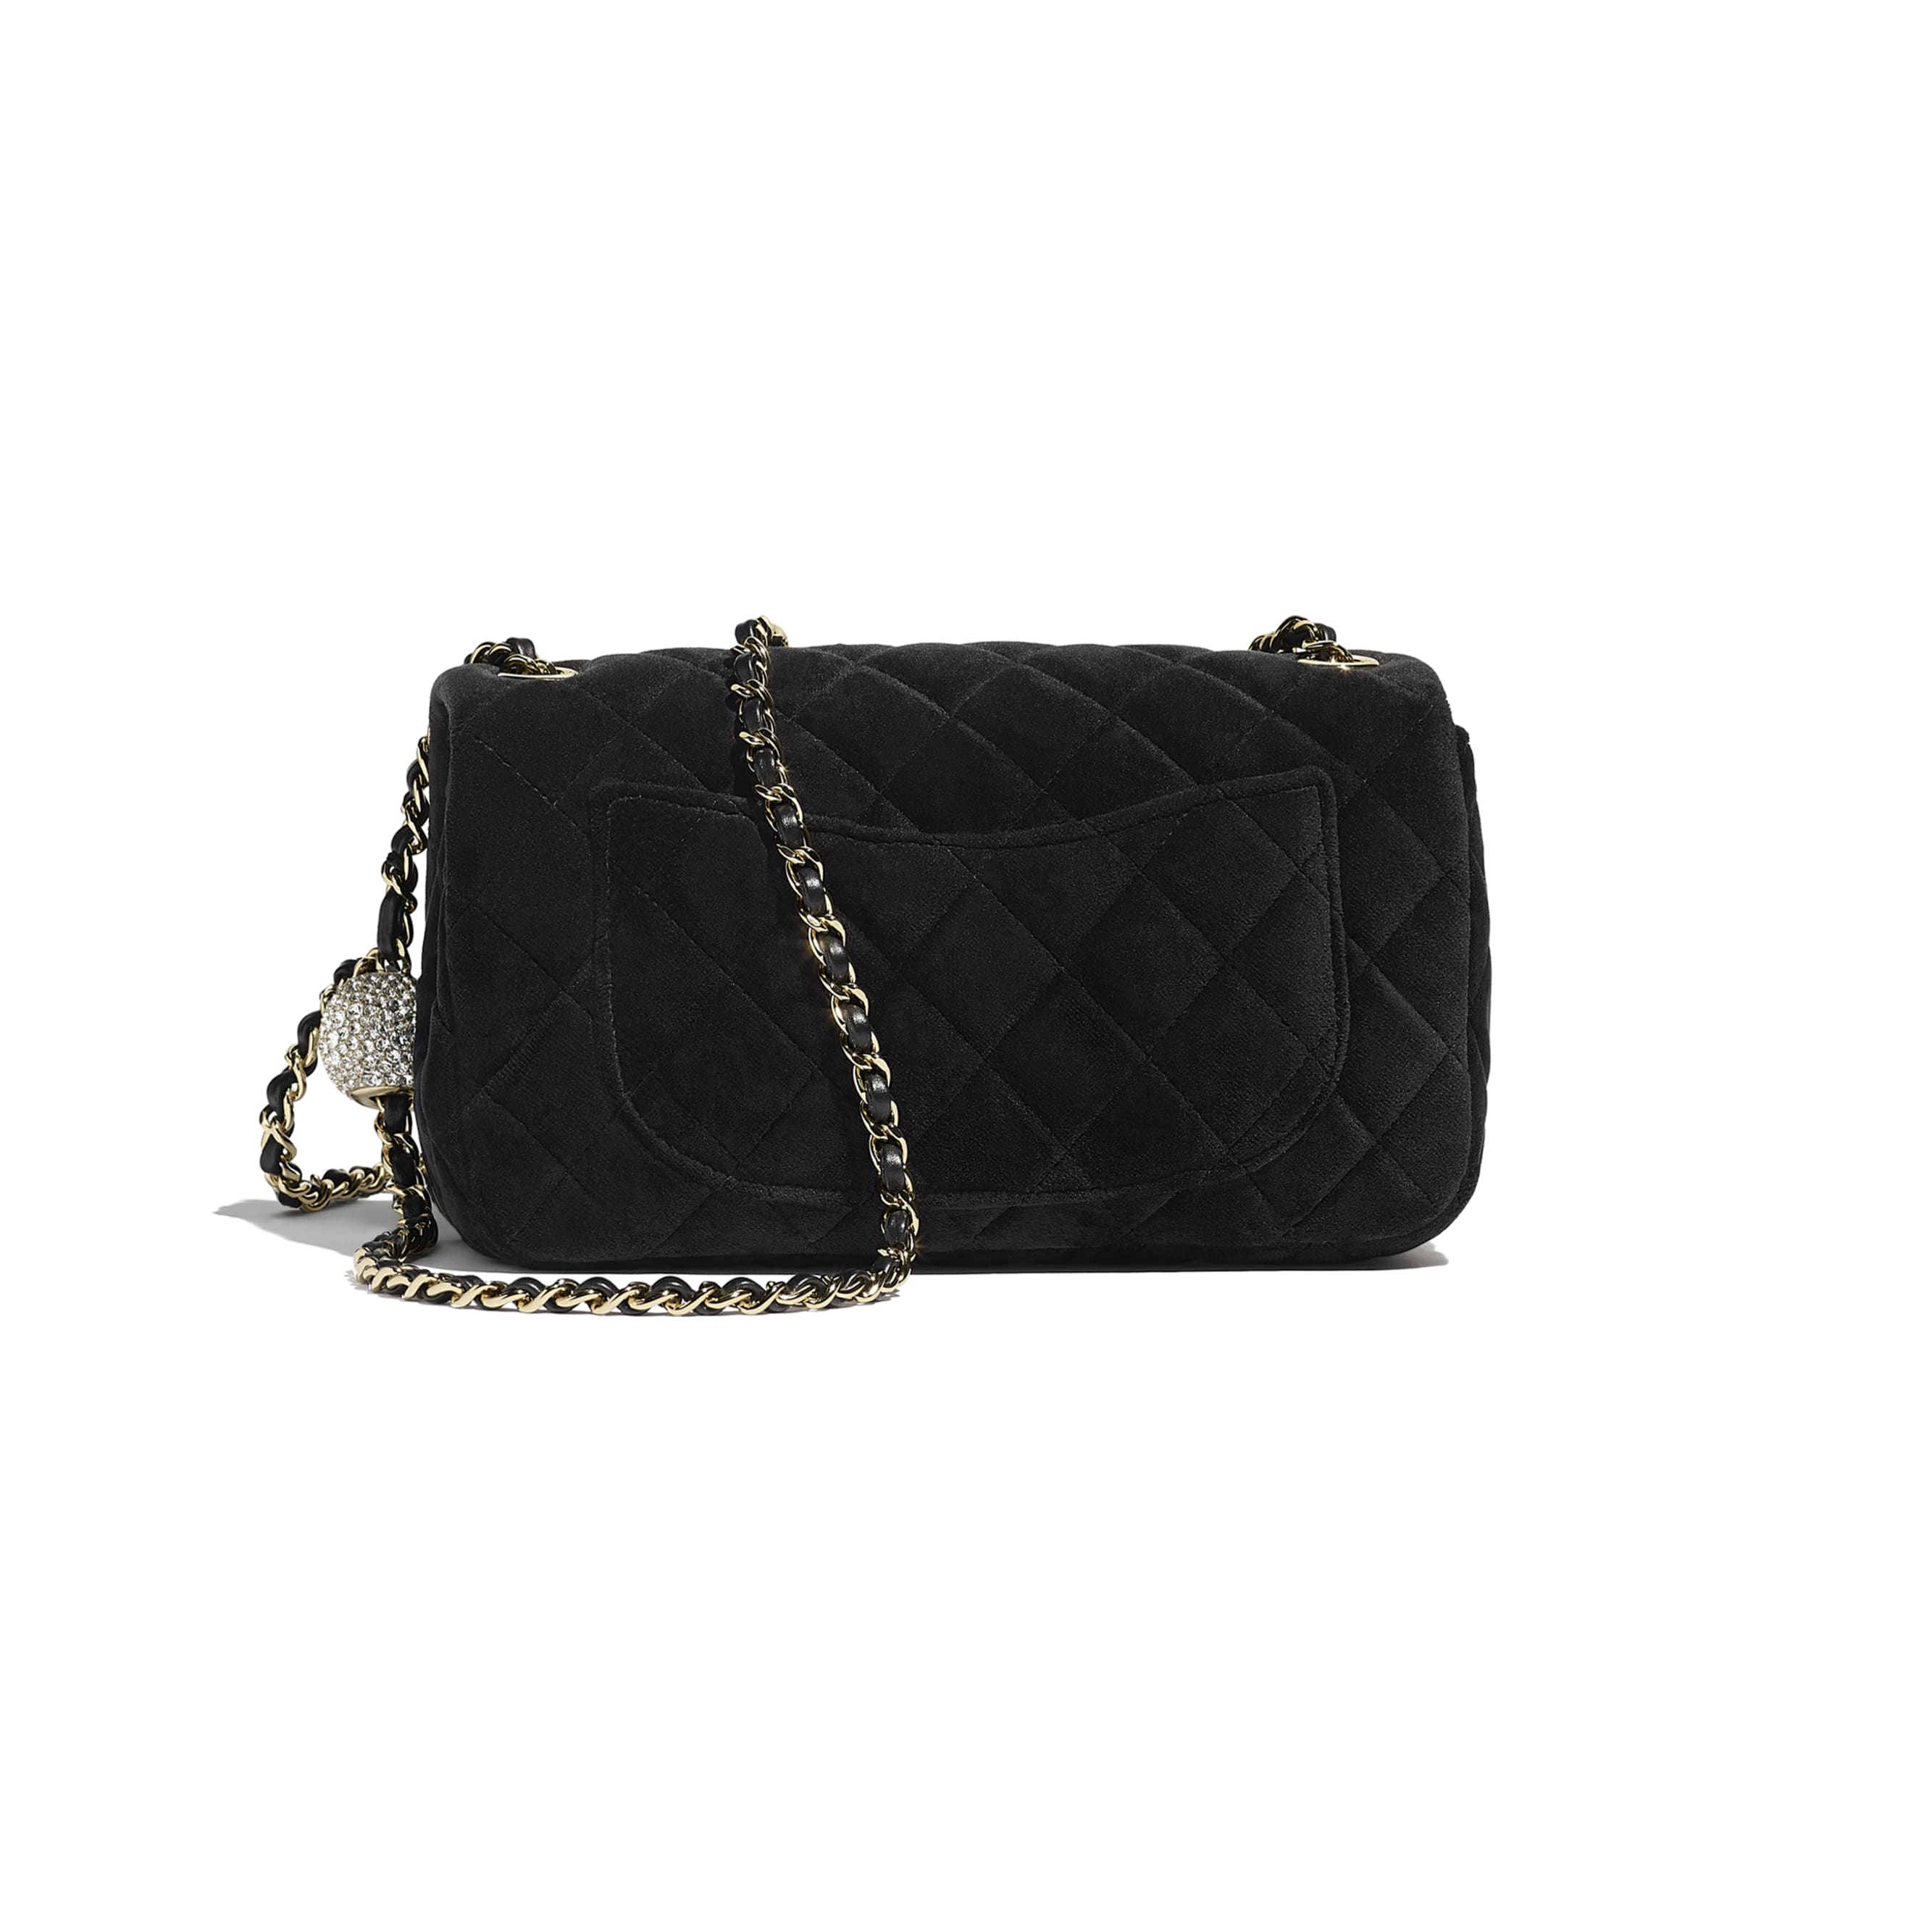 Flap Bag - Black - Velvet, Diamanté & Gold-Tone Metal - CHANEL - Alternative view - see standard sized version